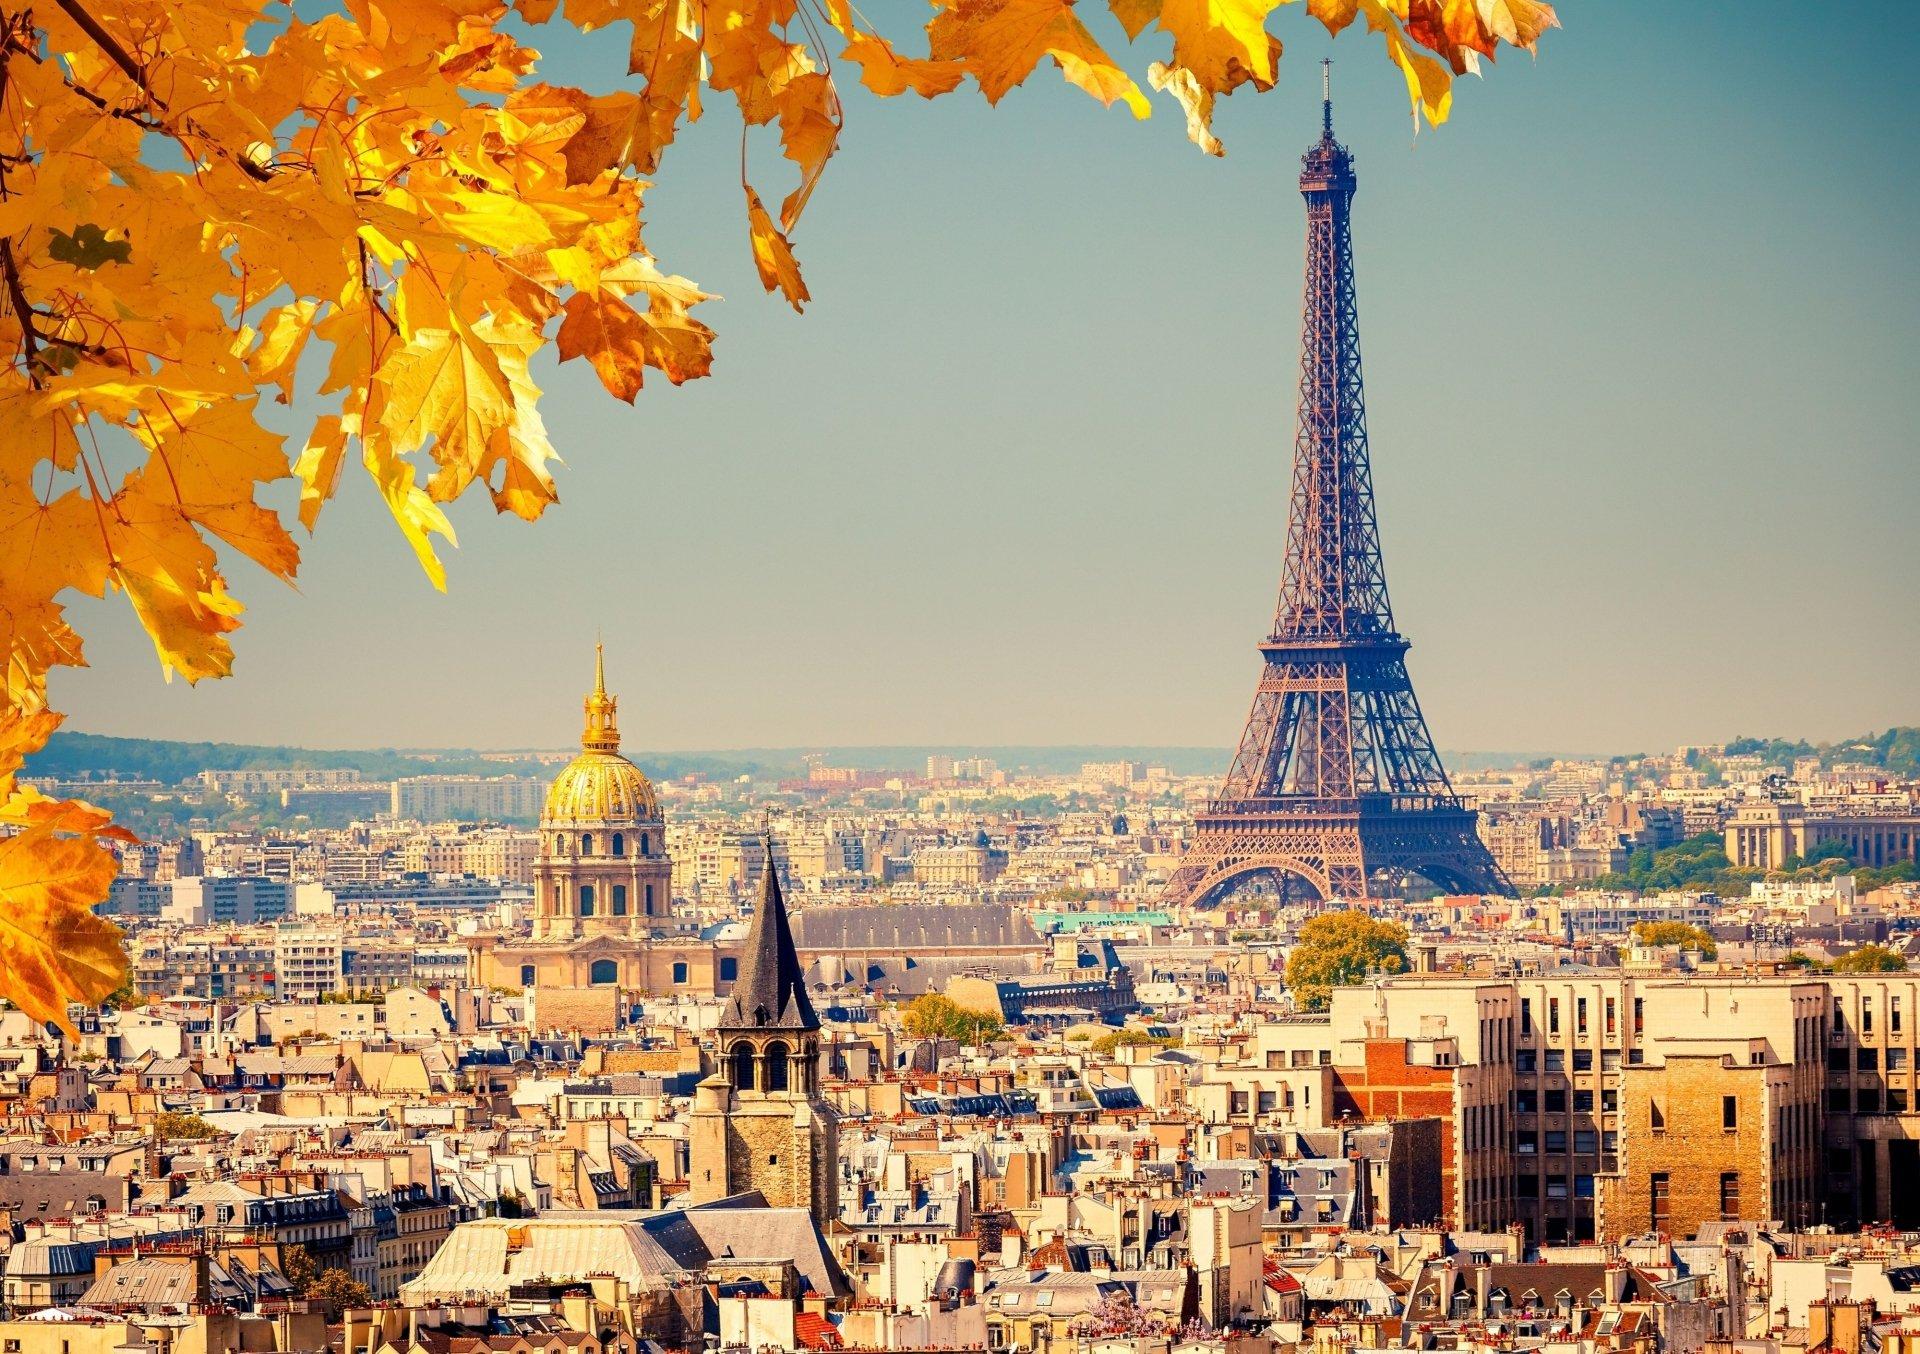 Man Made - Eiffel Tower  Paris France Foliage Wallpaper